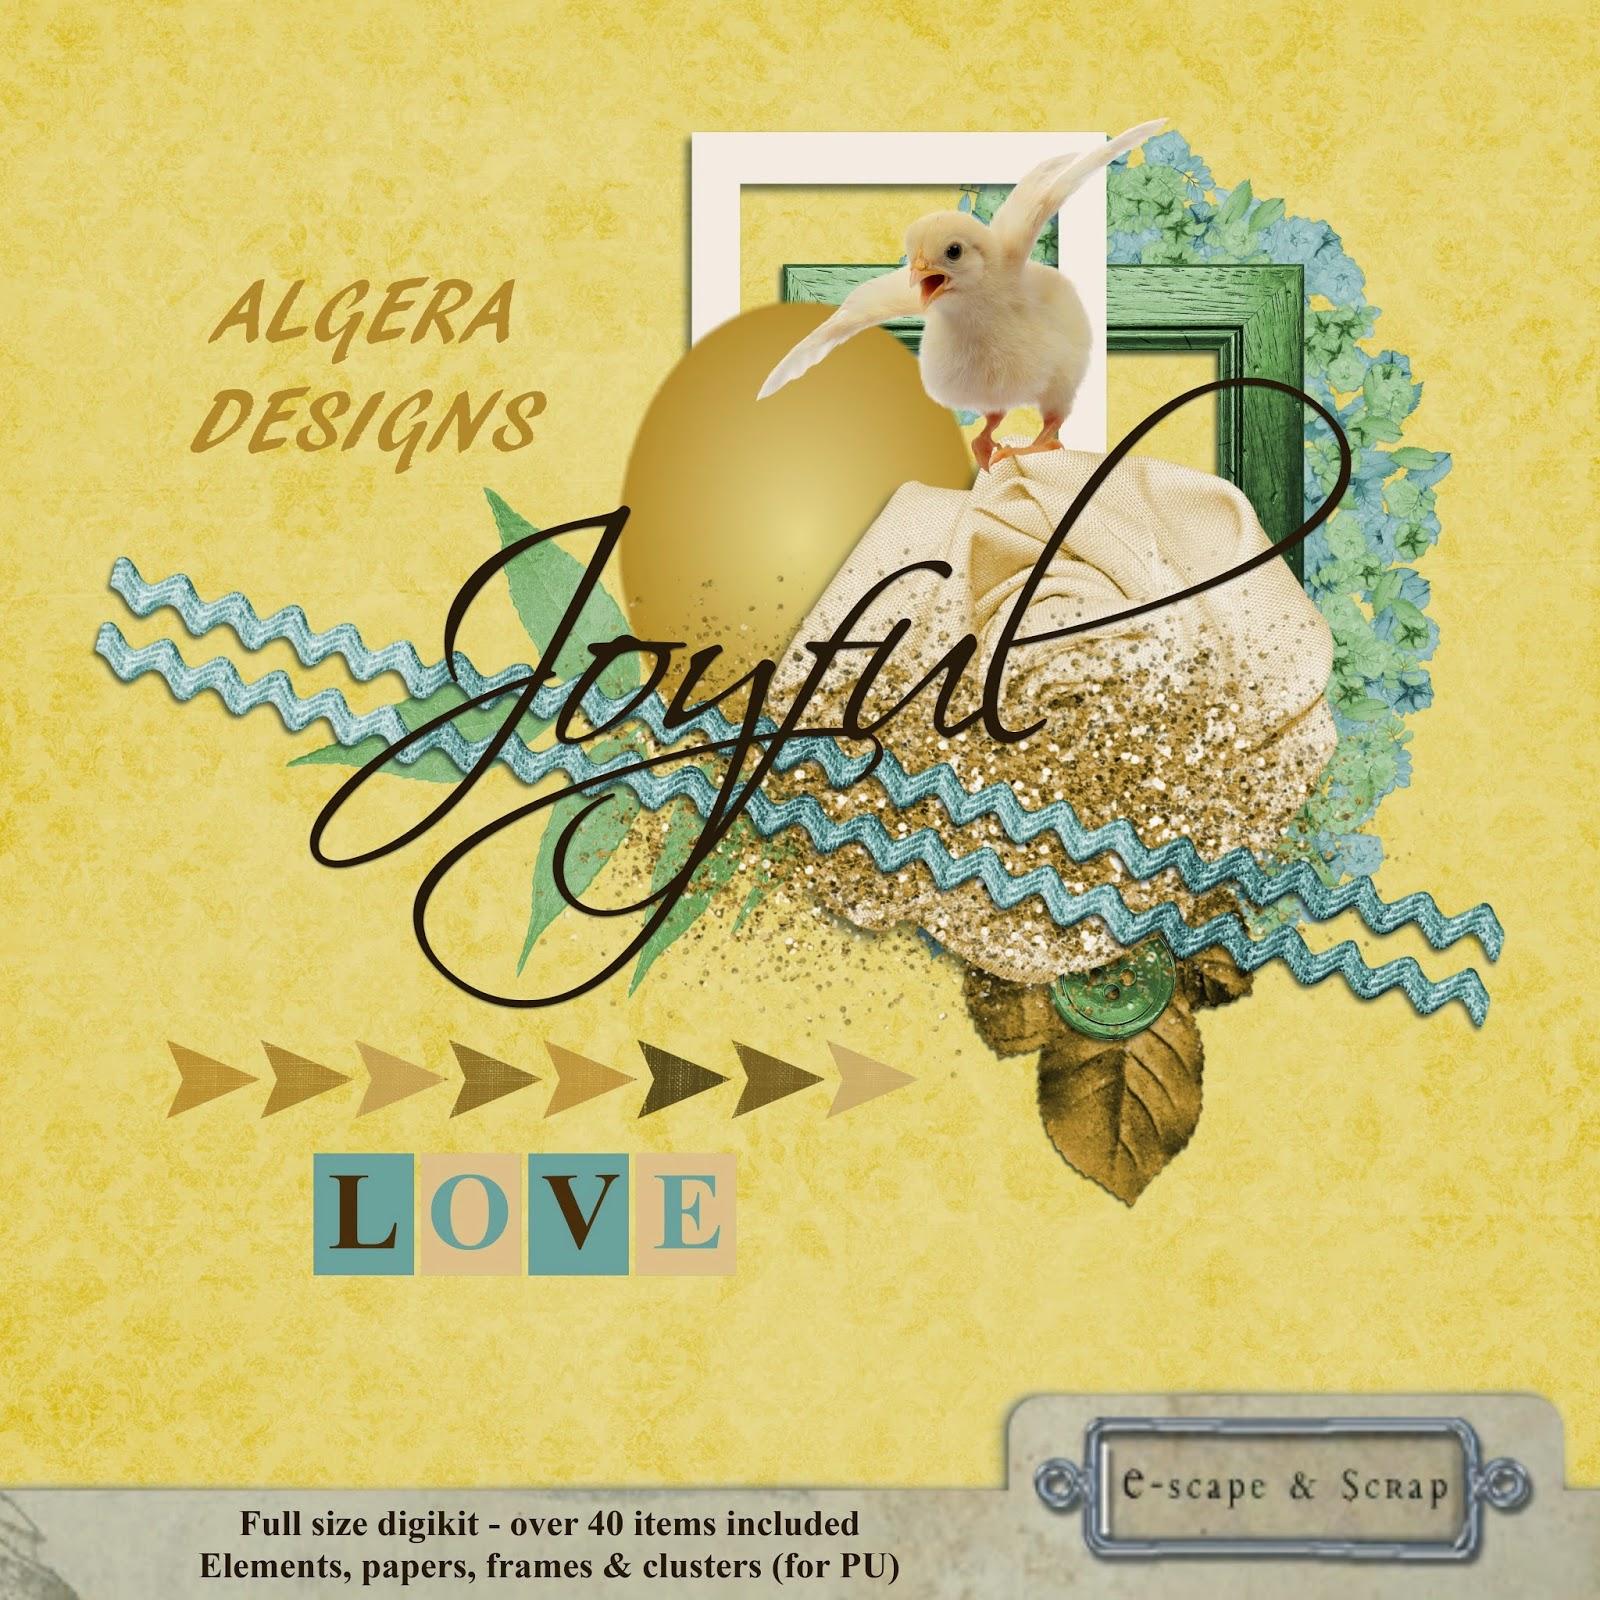 http://4.bp.blogspot.com/-43pbdbE2ztE/VRkjkTx0o3I/AAAAAAAAGDc/MGb2nKJt-vo/s1600/Joyful_Preview_AlgeraDesigns.jpg